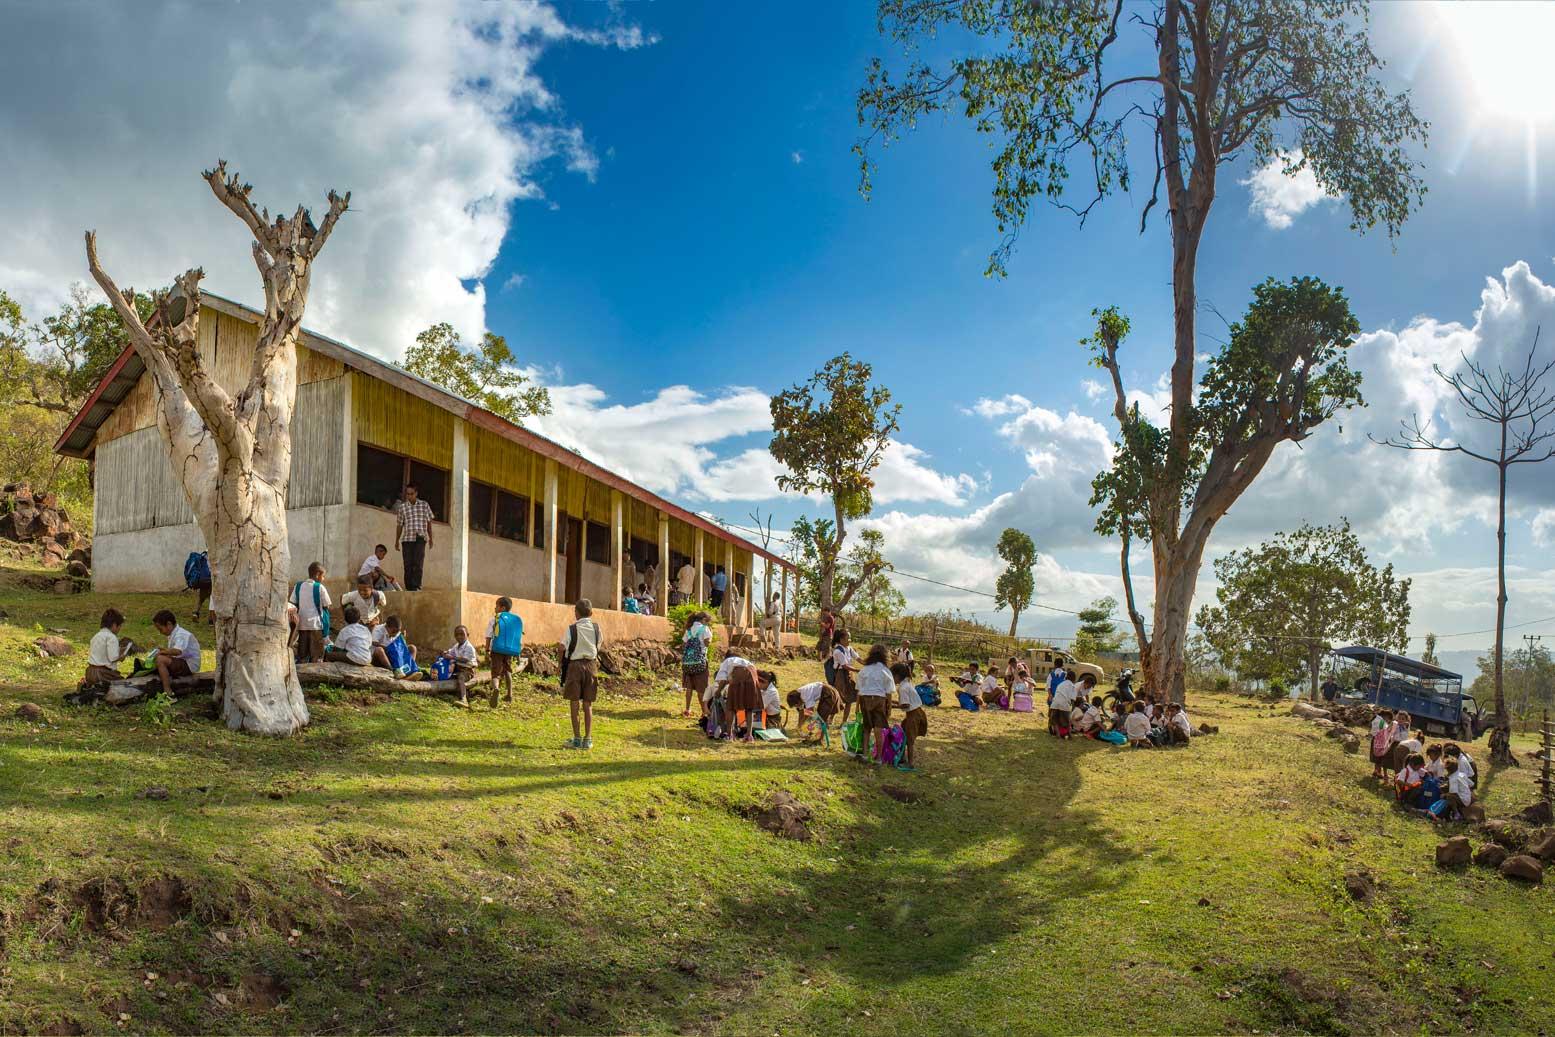 Historic Vessel VegaKits 4 Kids visit EBF Wairoke